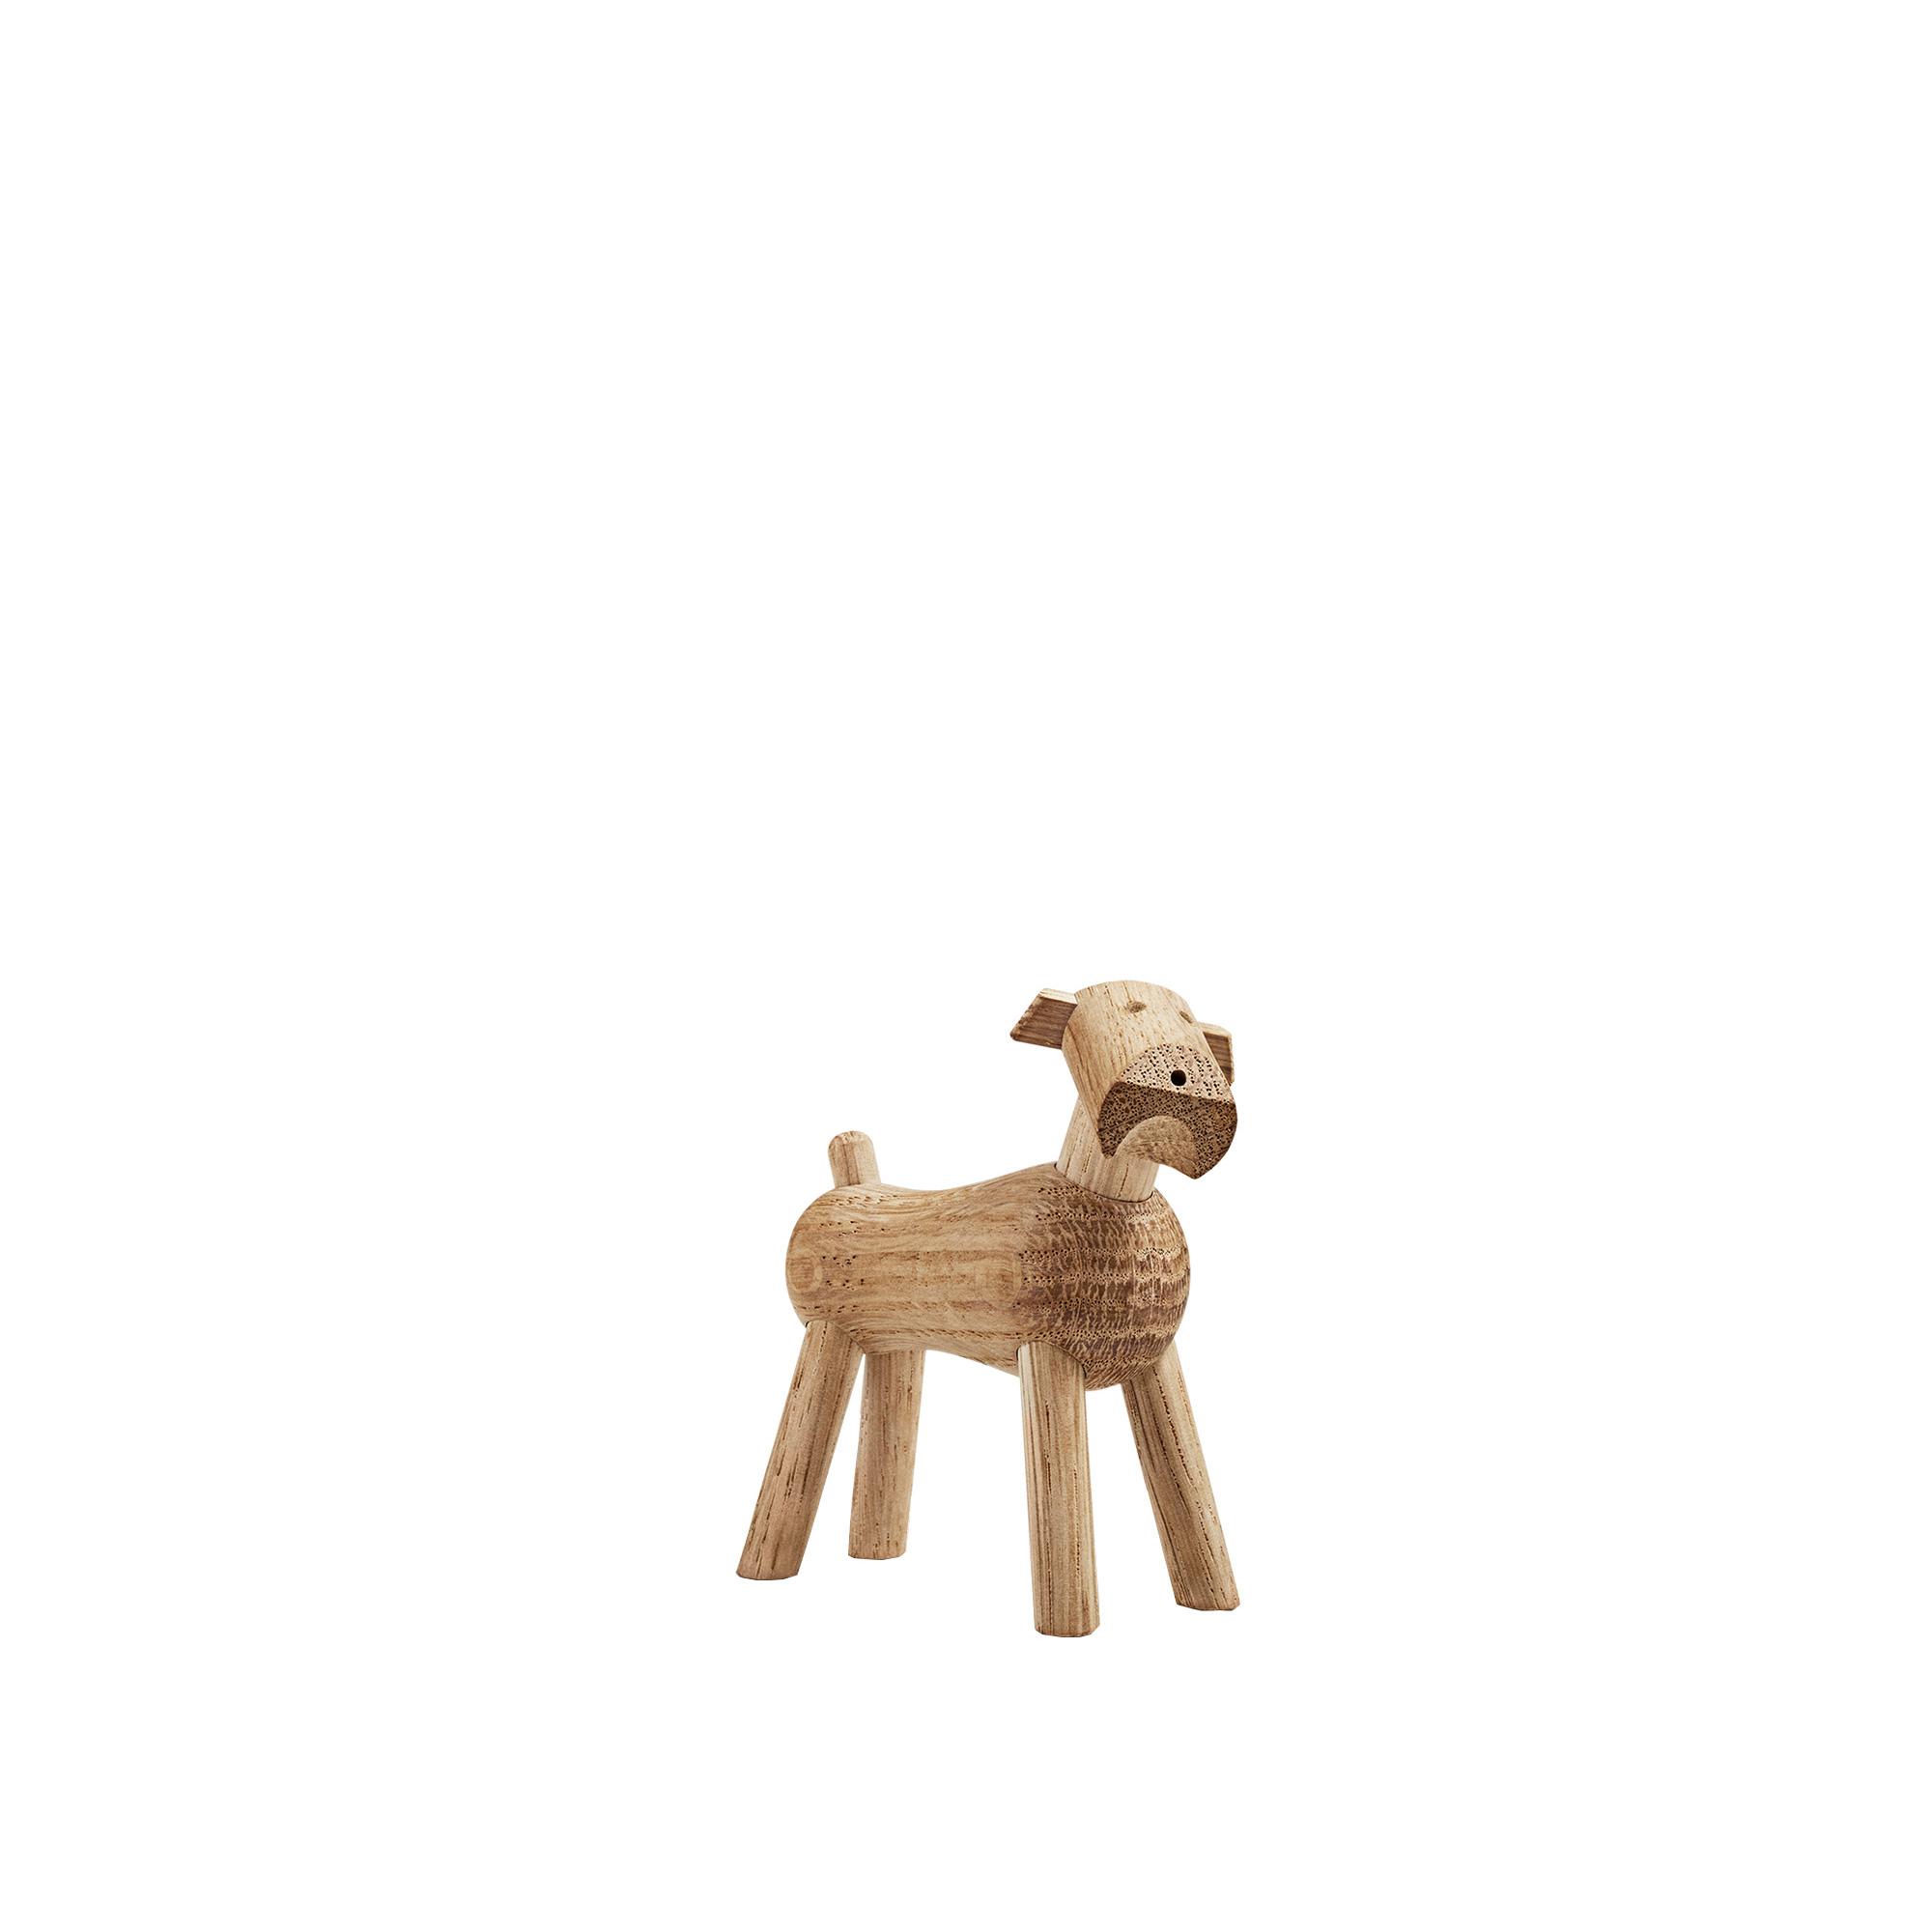 Utestående Köp Hund Tim, Ek från Kay Bojesen | Nordiska Galleriet DO-48